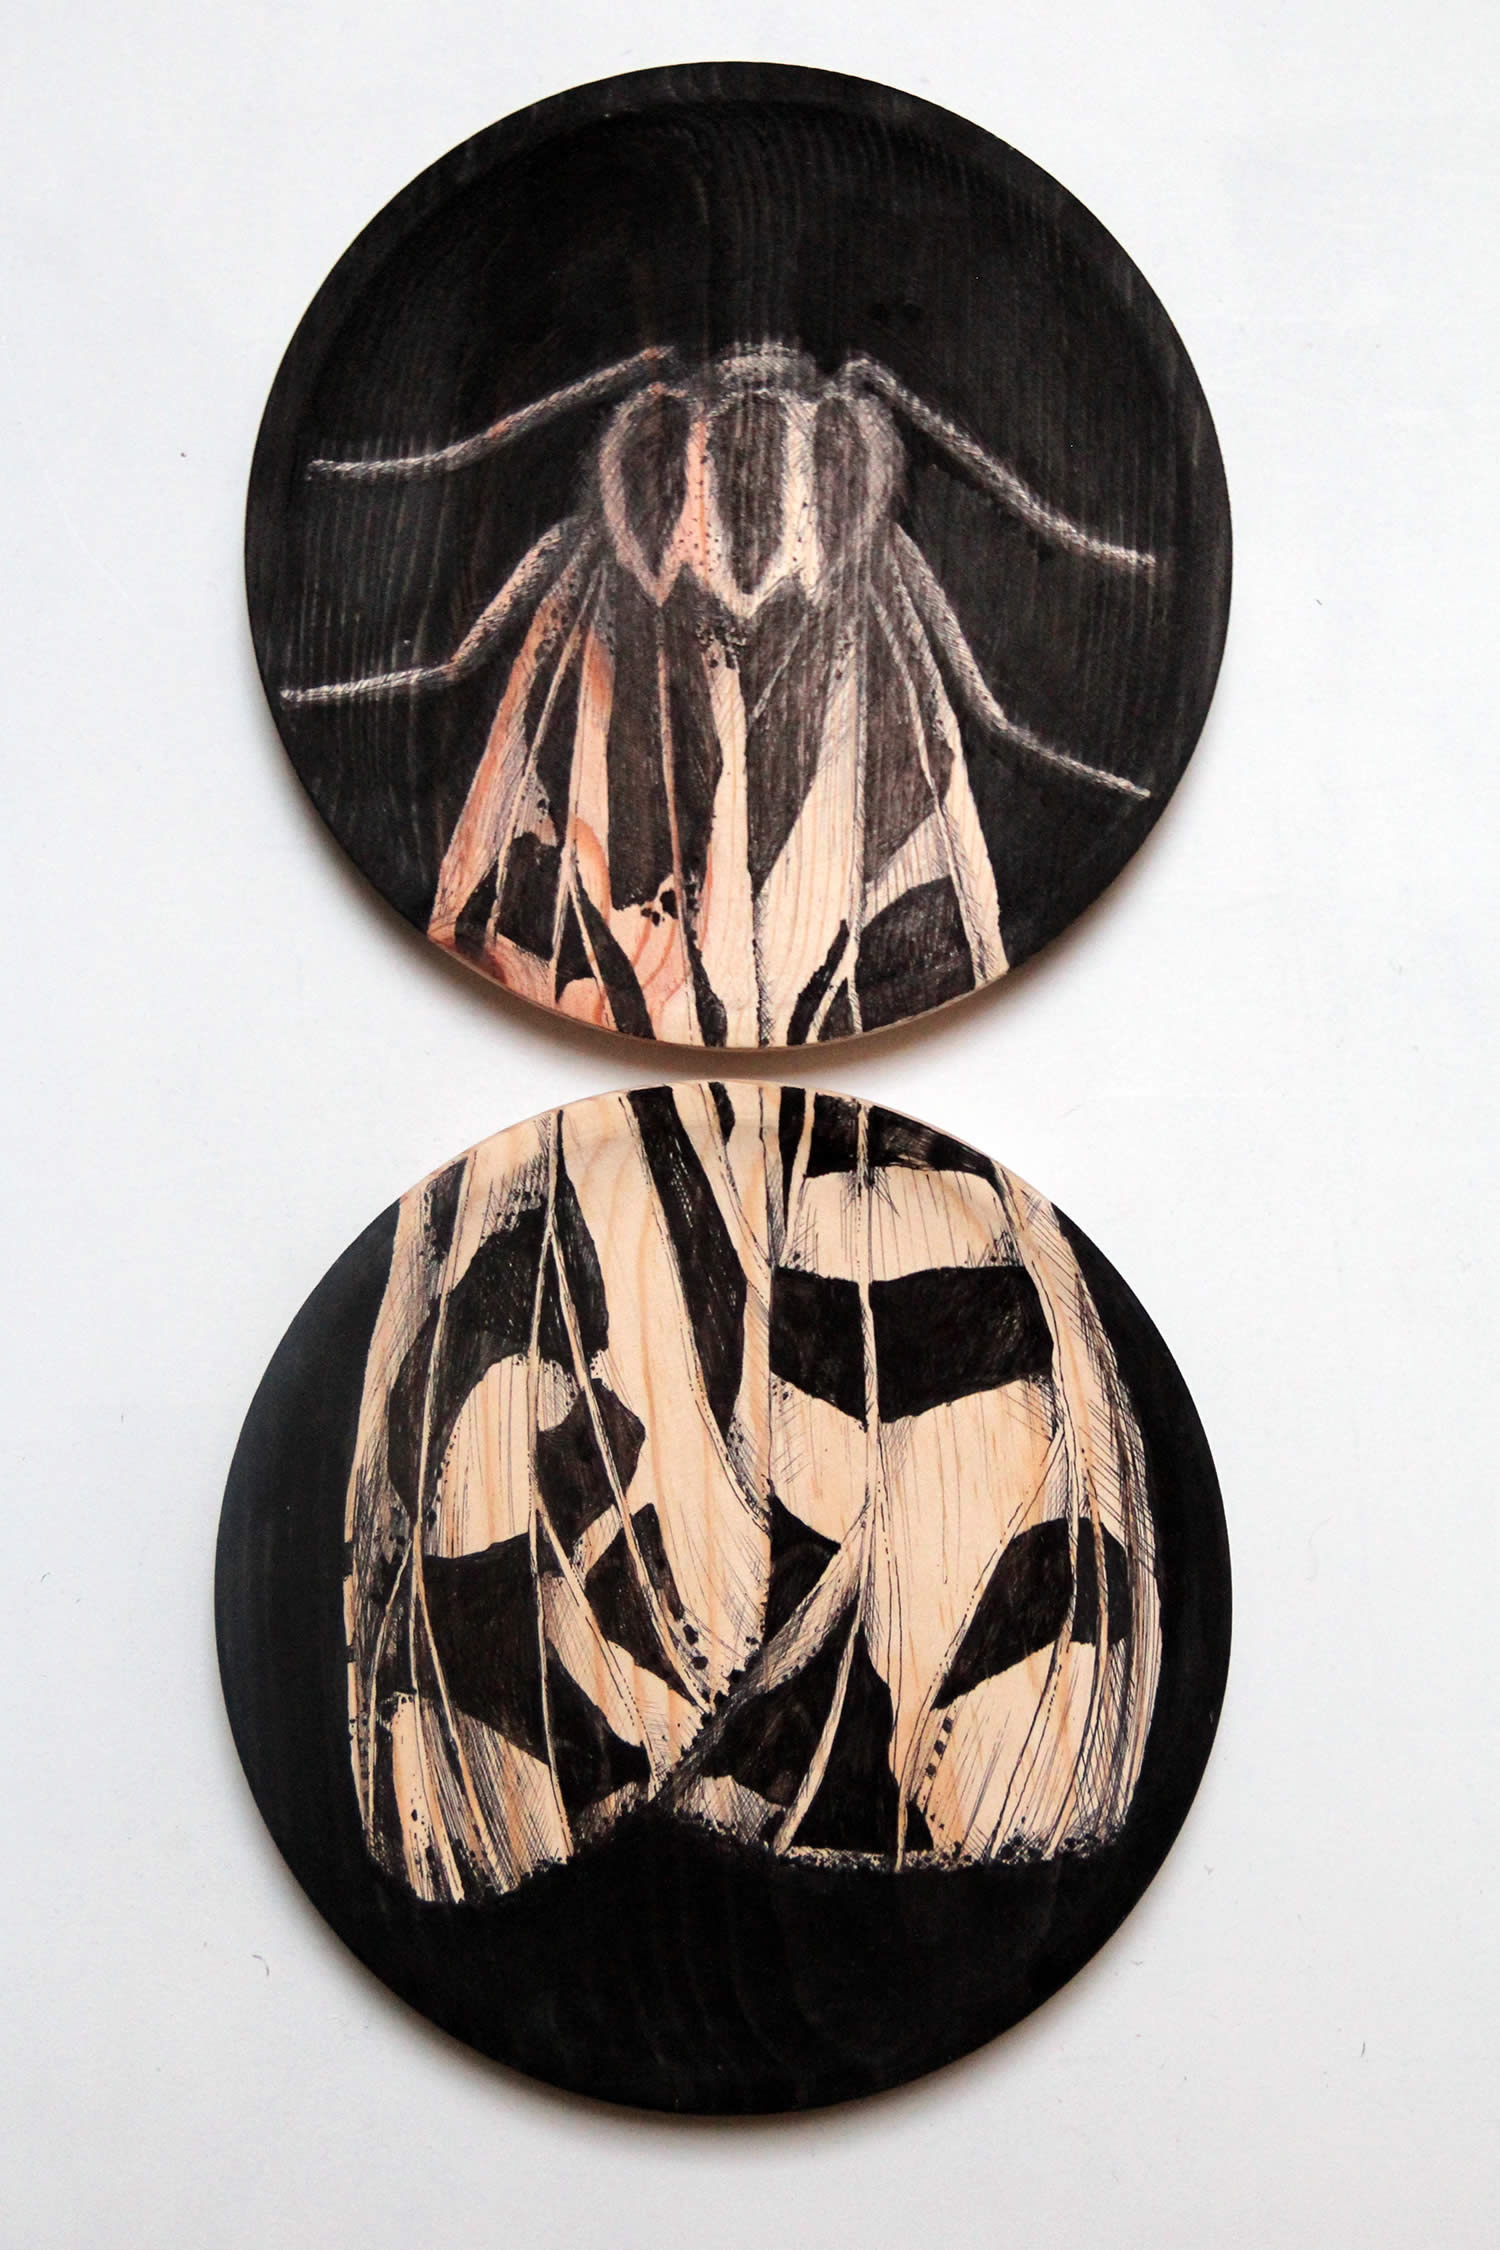 moth illustration on wood by raul gutierrez